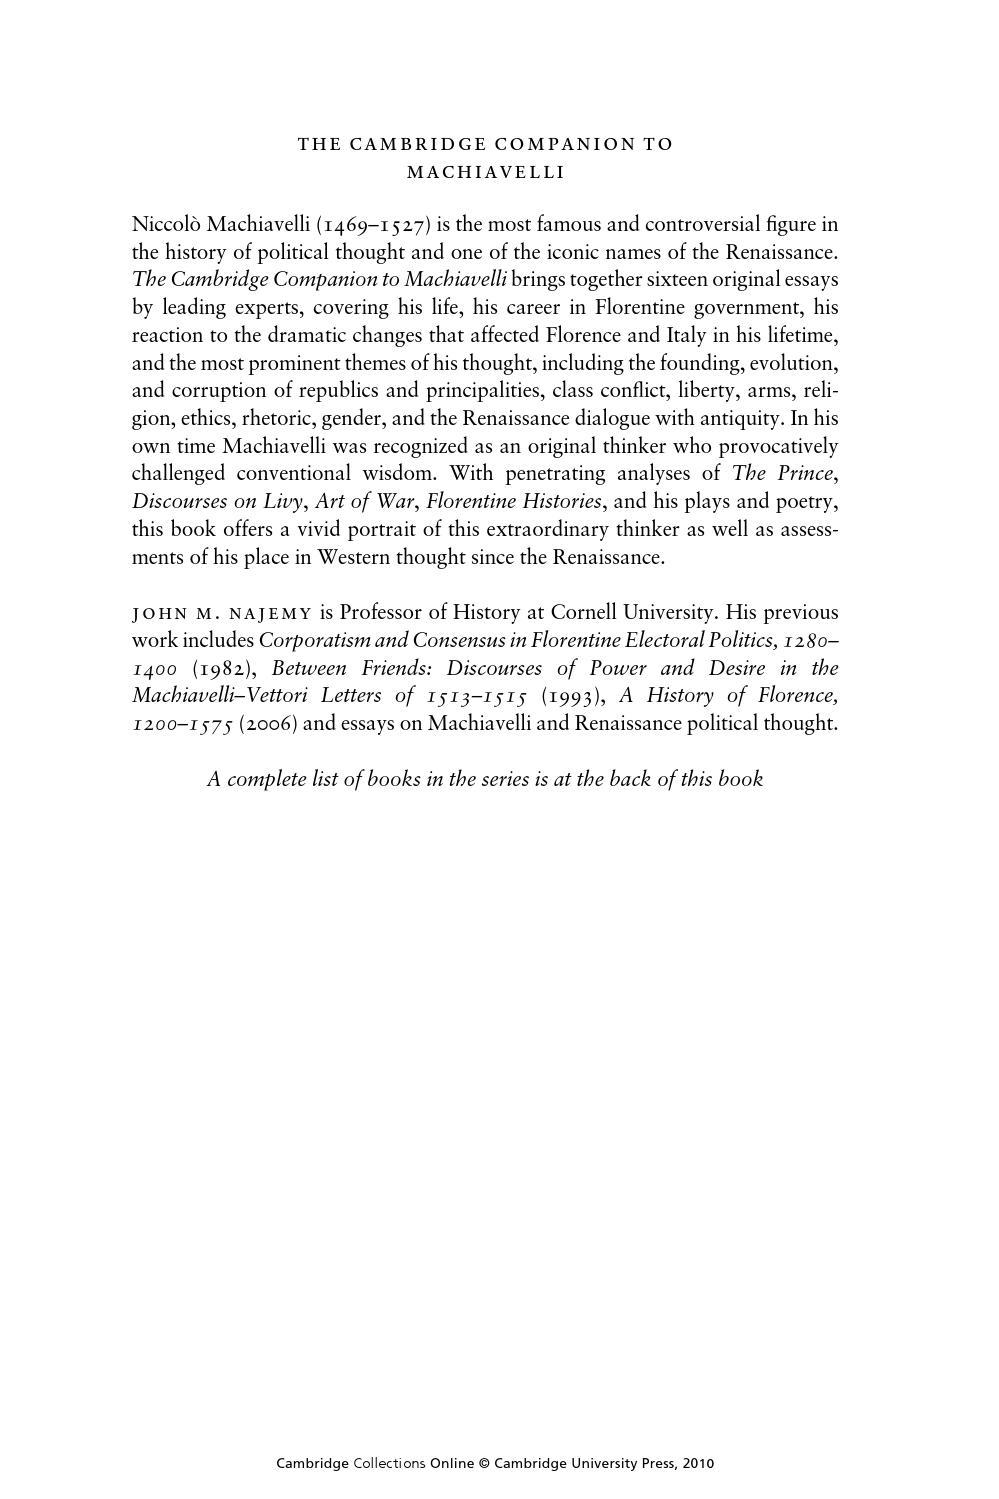 machiavellian commander essay